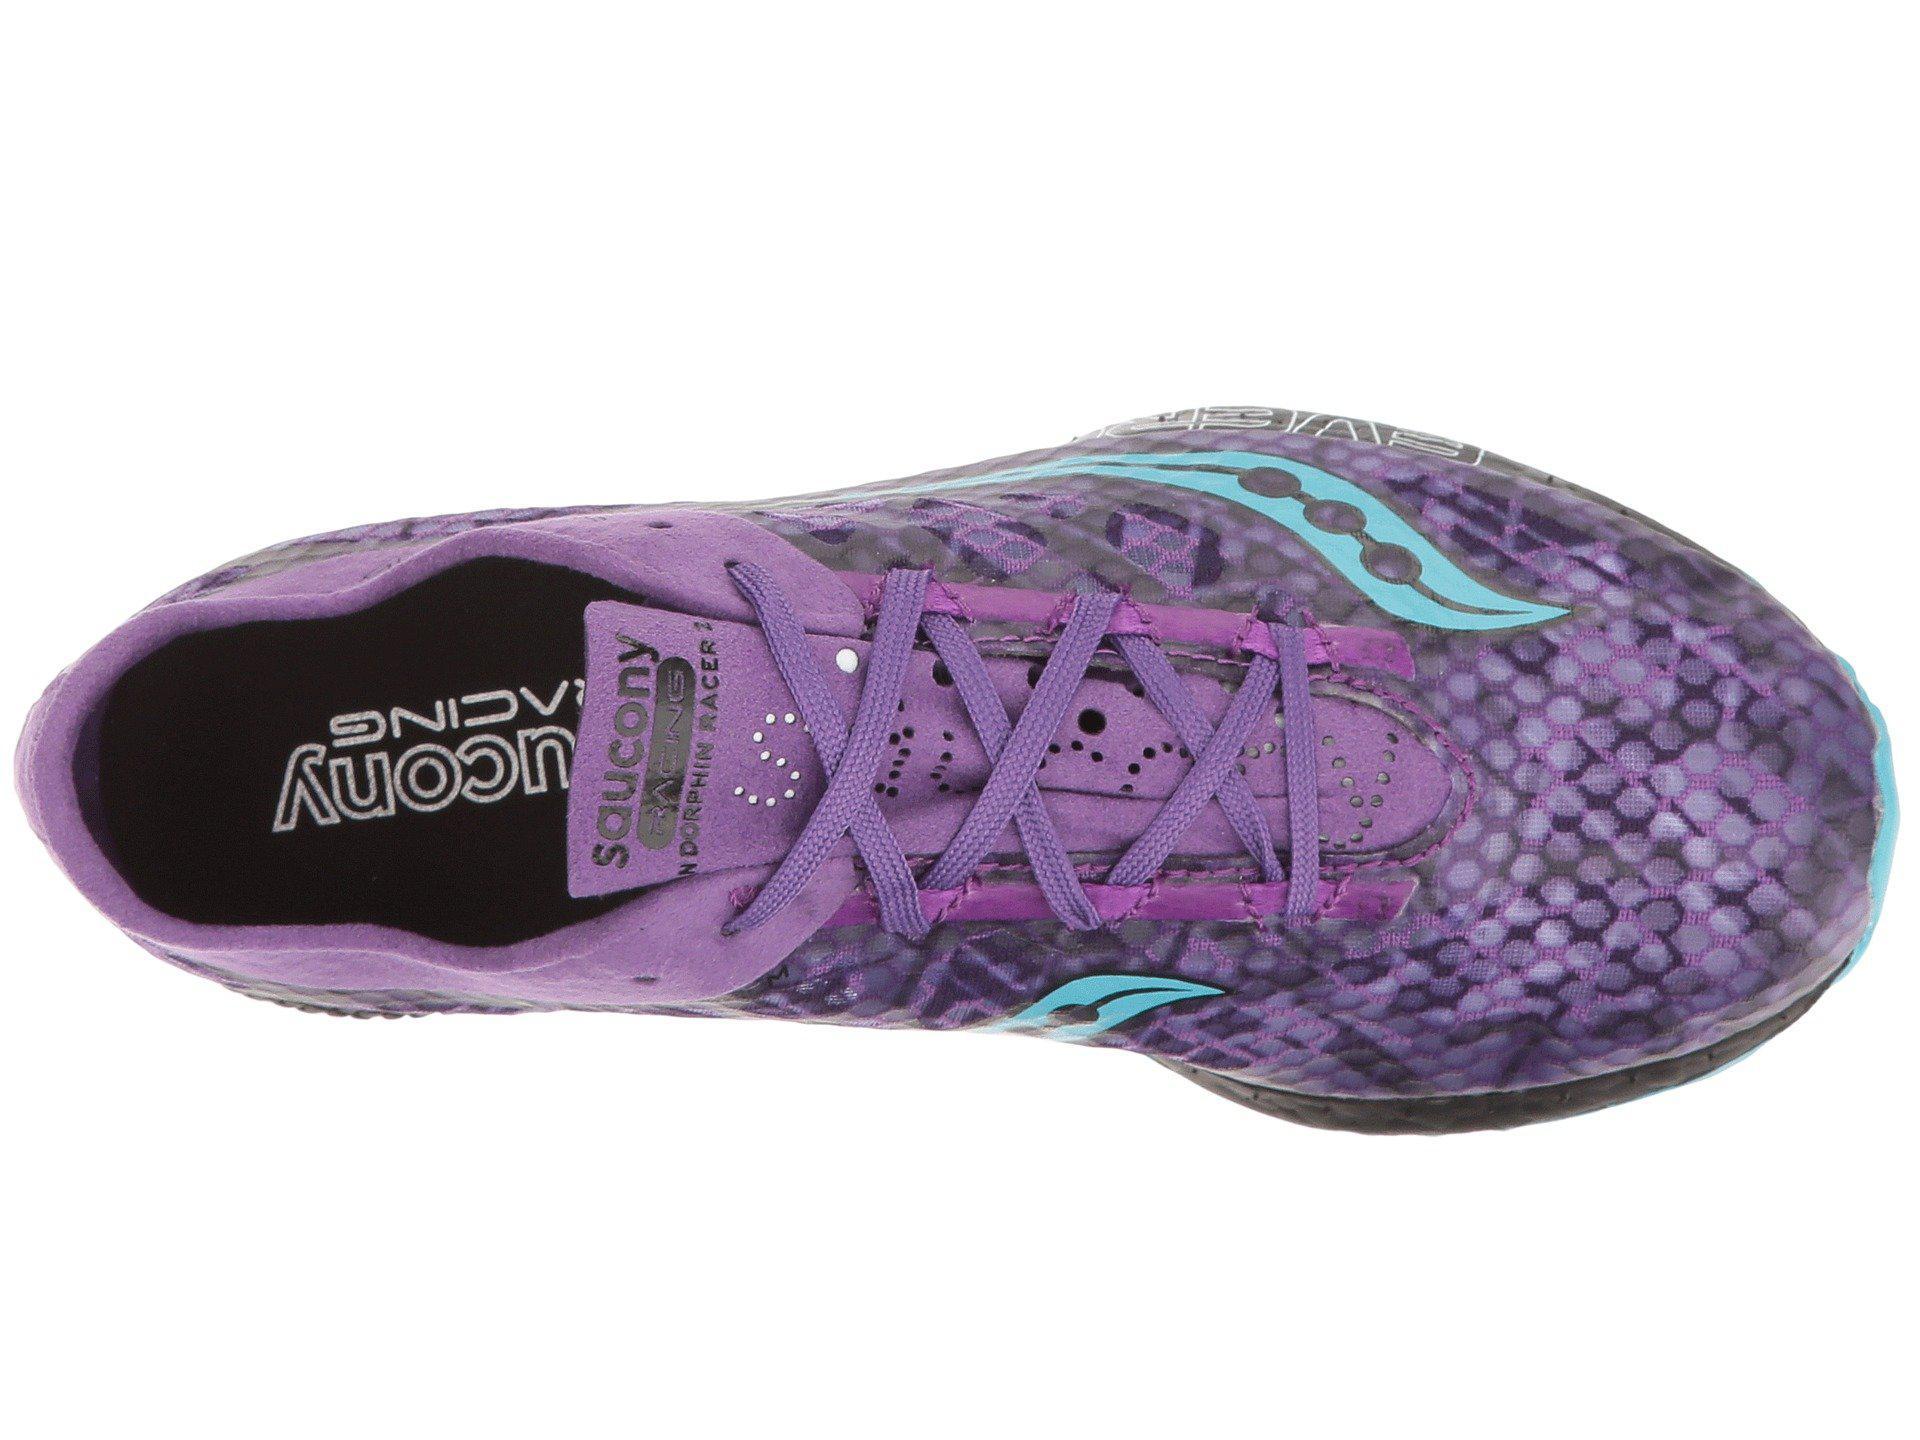 44e9cf341dda Saucony - Endorphin Racer 2 (purple teal) Women s Shoes - Lyst. View  fullscreen